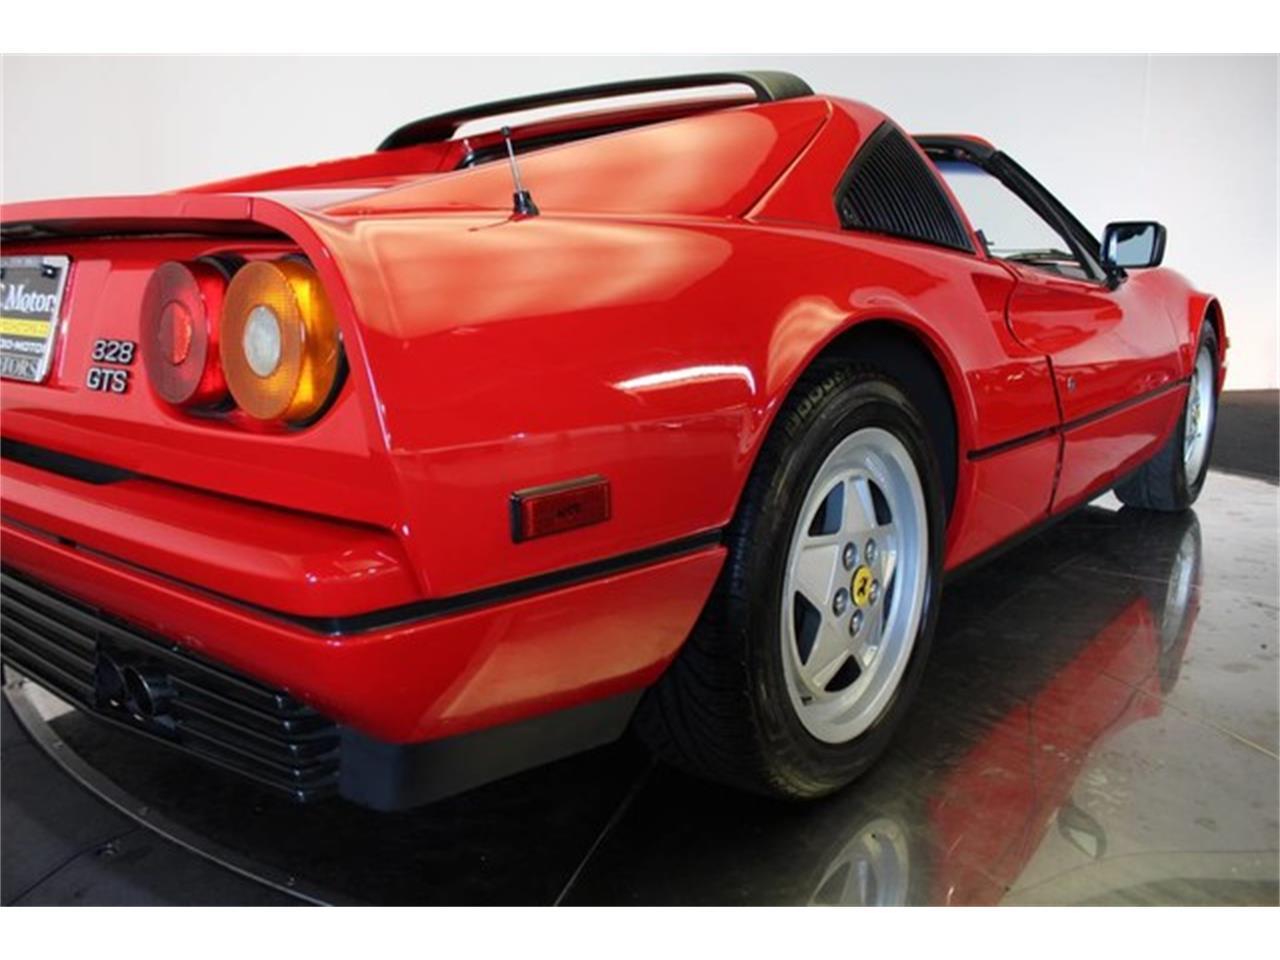 Large Picture of '89 Ferrari 328 - $79,900.00 Offered by DC Motors - K8EK